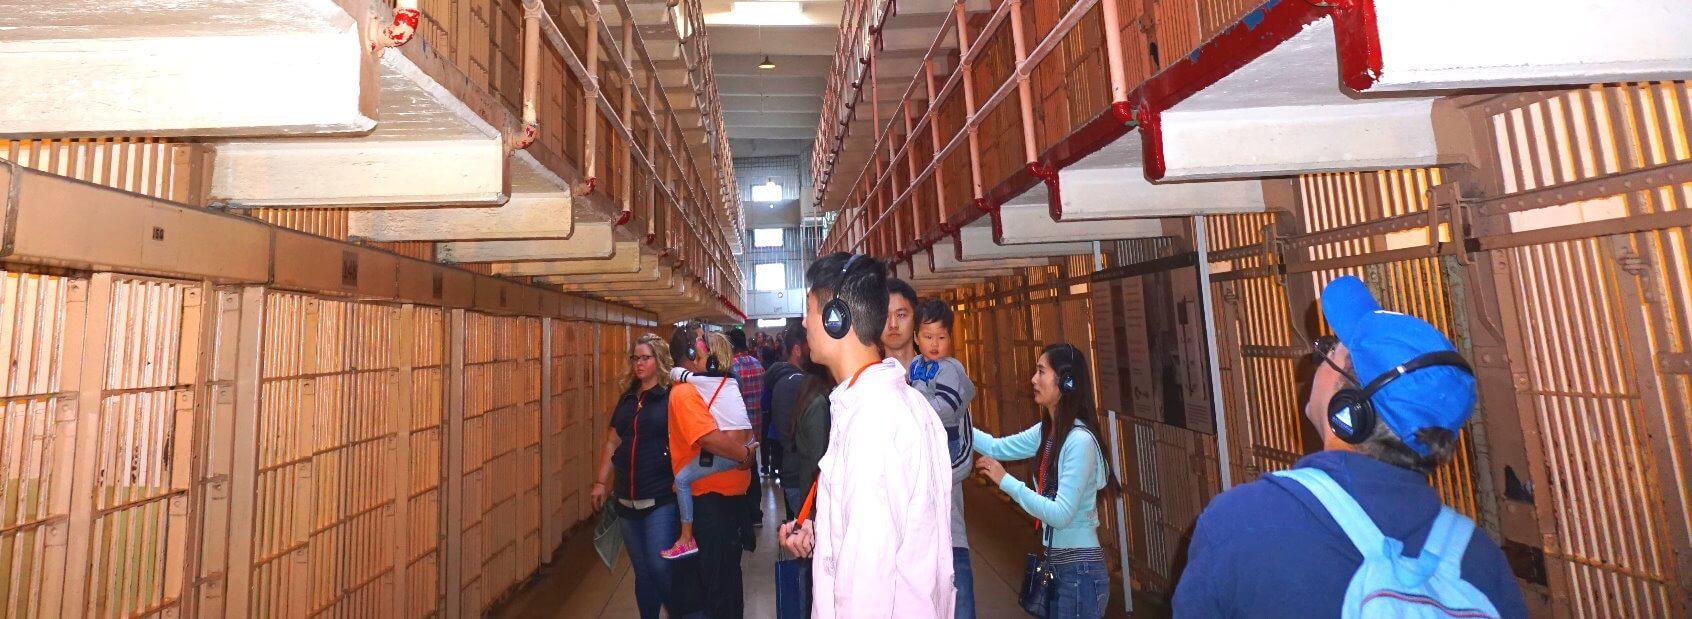 alcatraz-jail-tickets-prison-tour-ferry-tickets